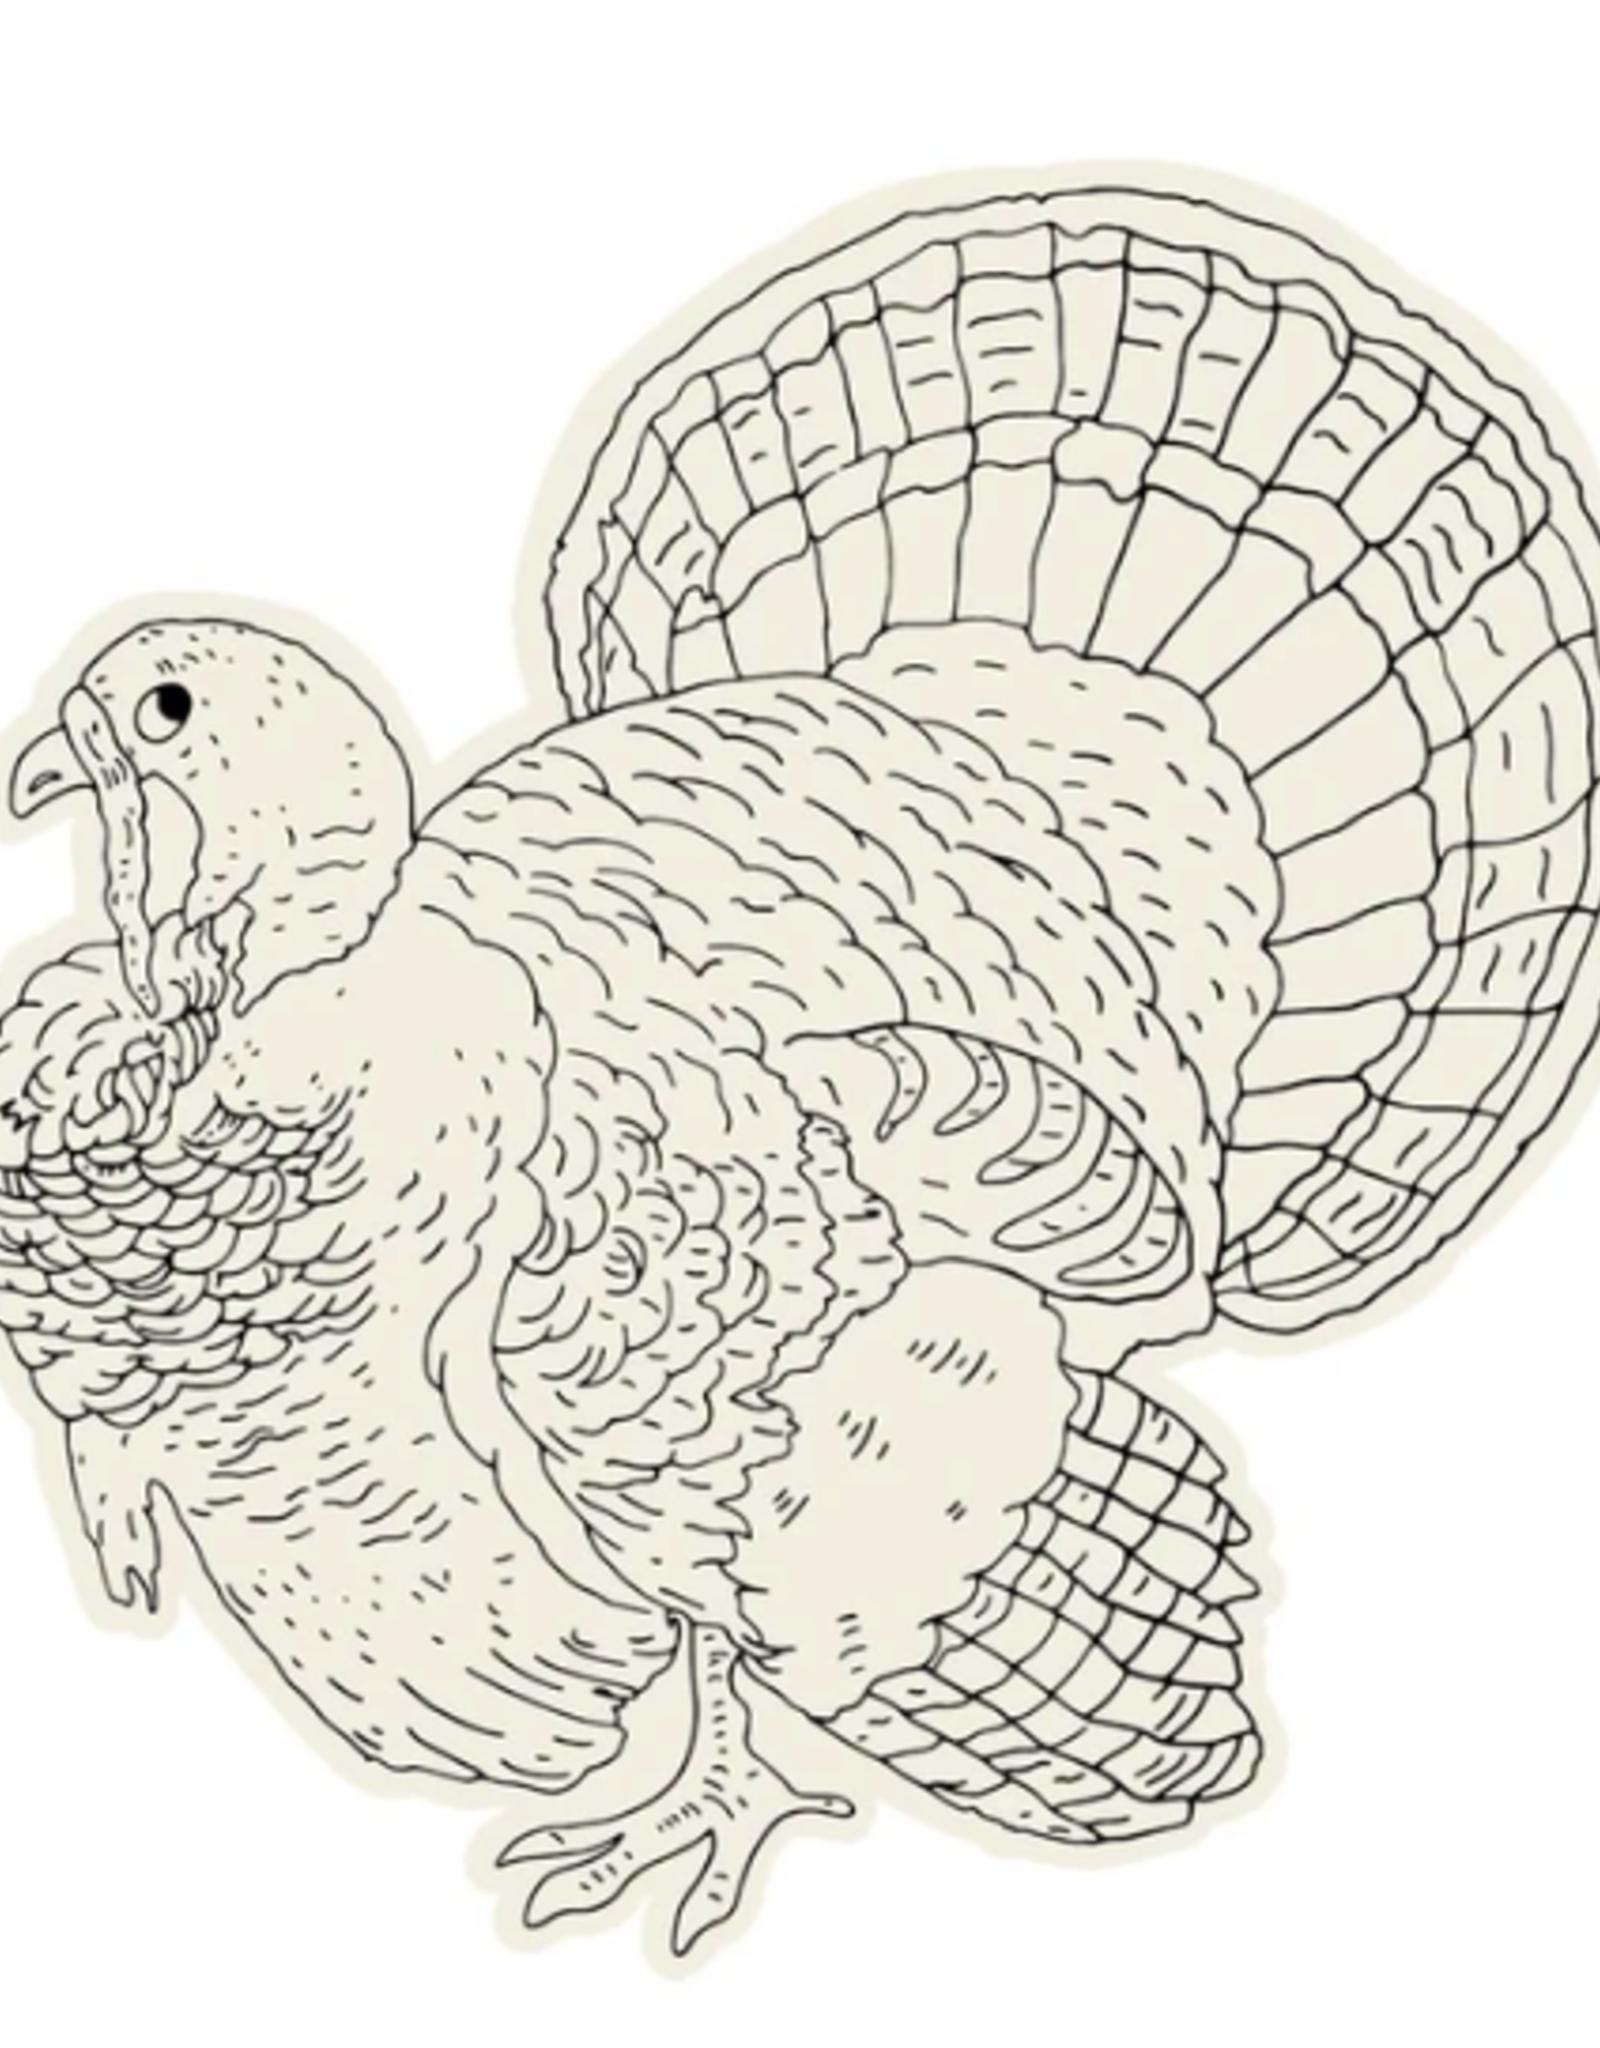 Die-Cut Coloring Turkey Placemat